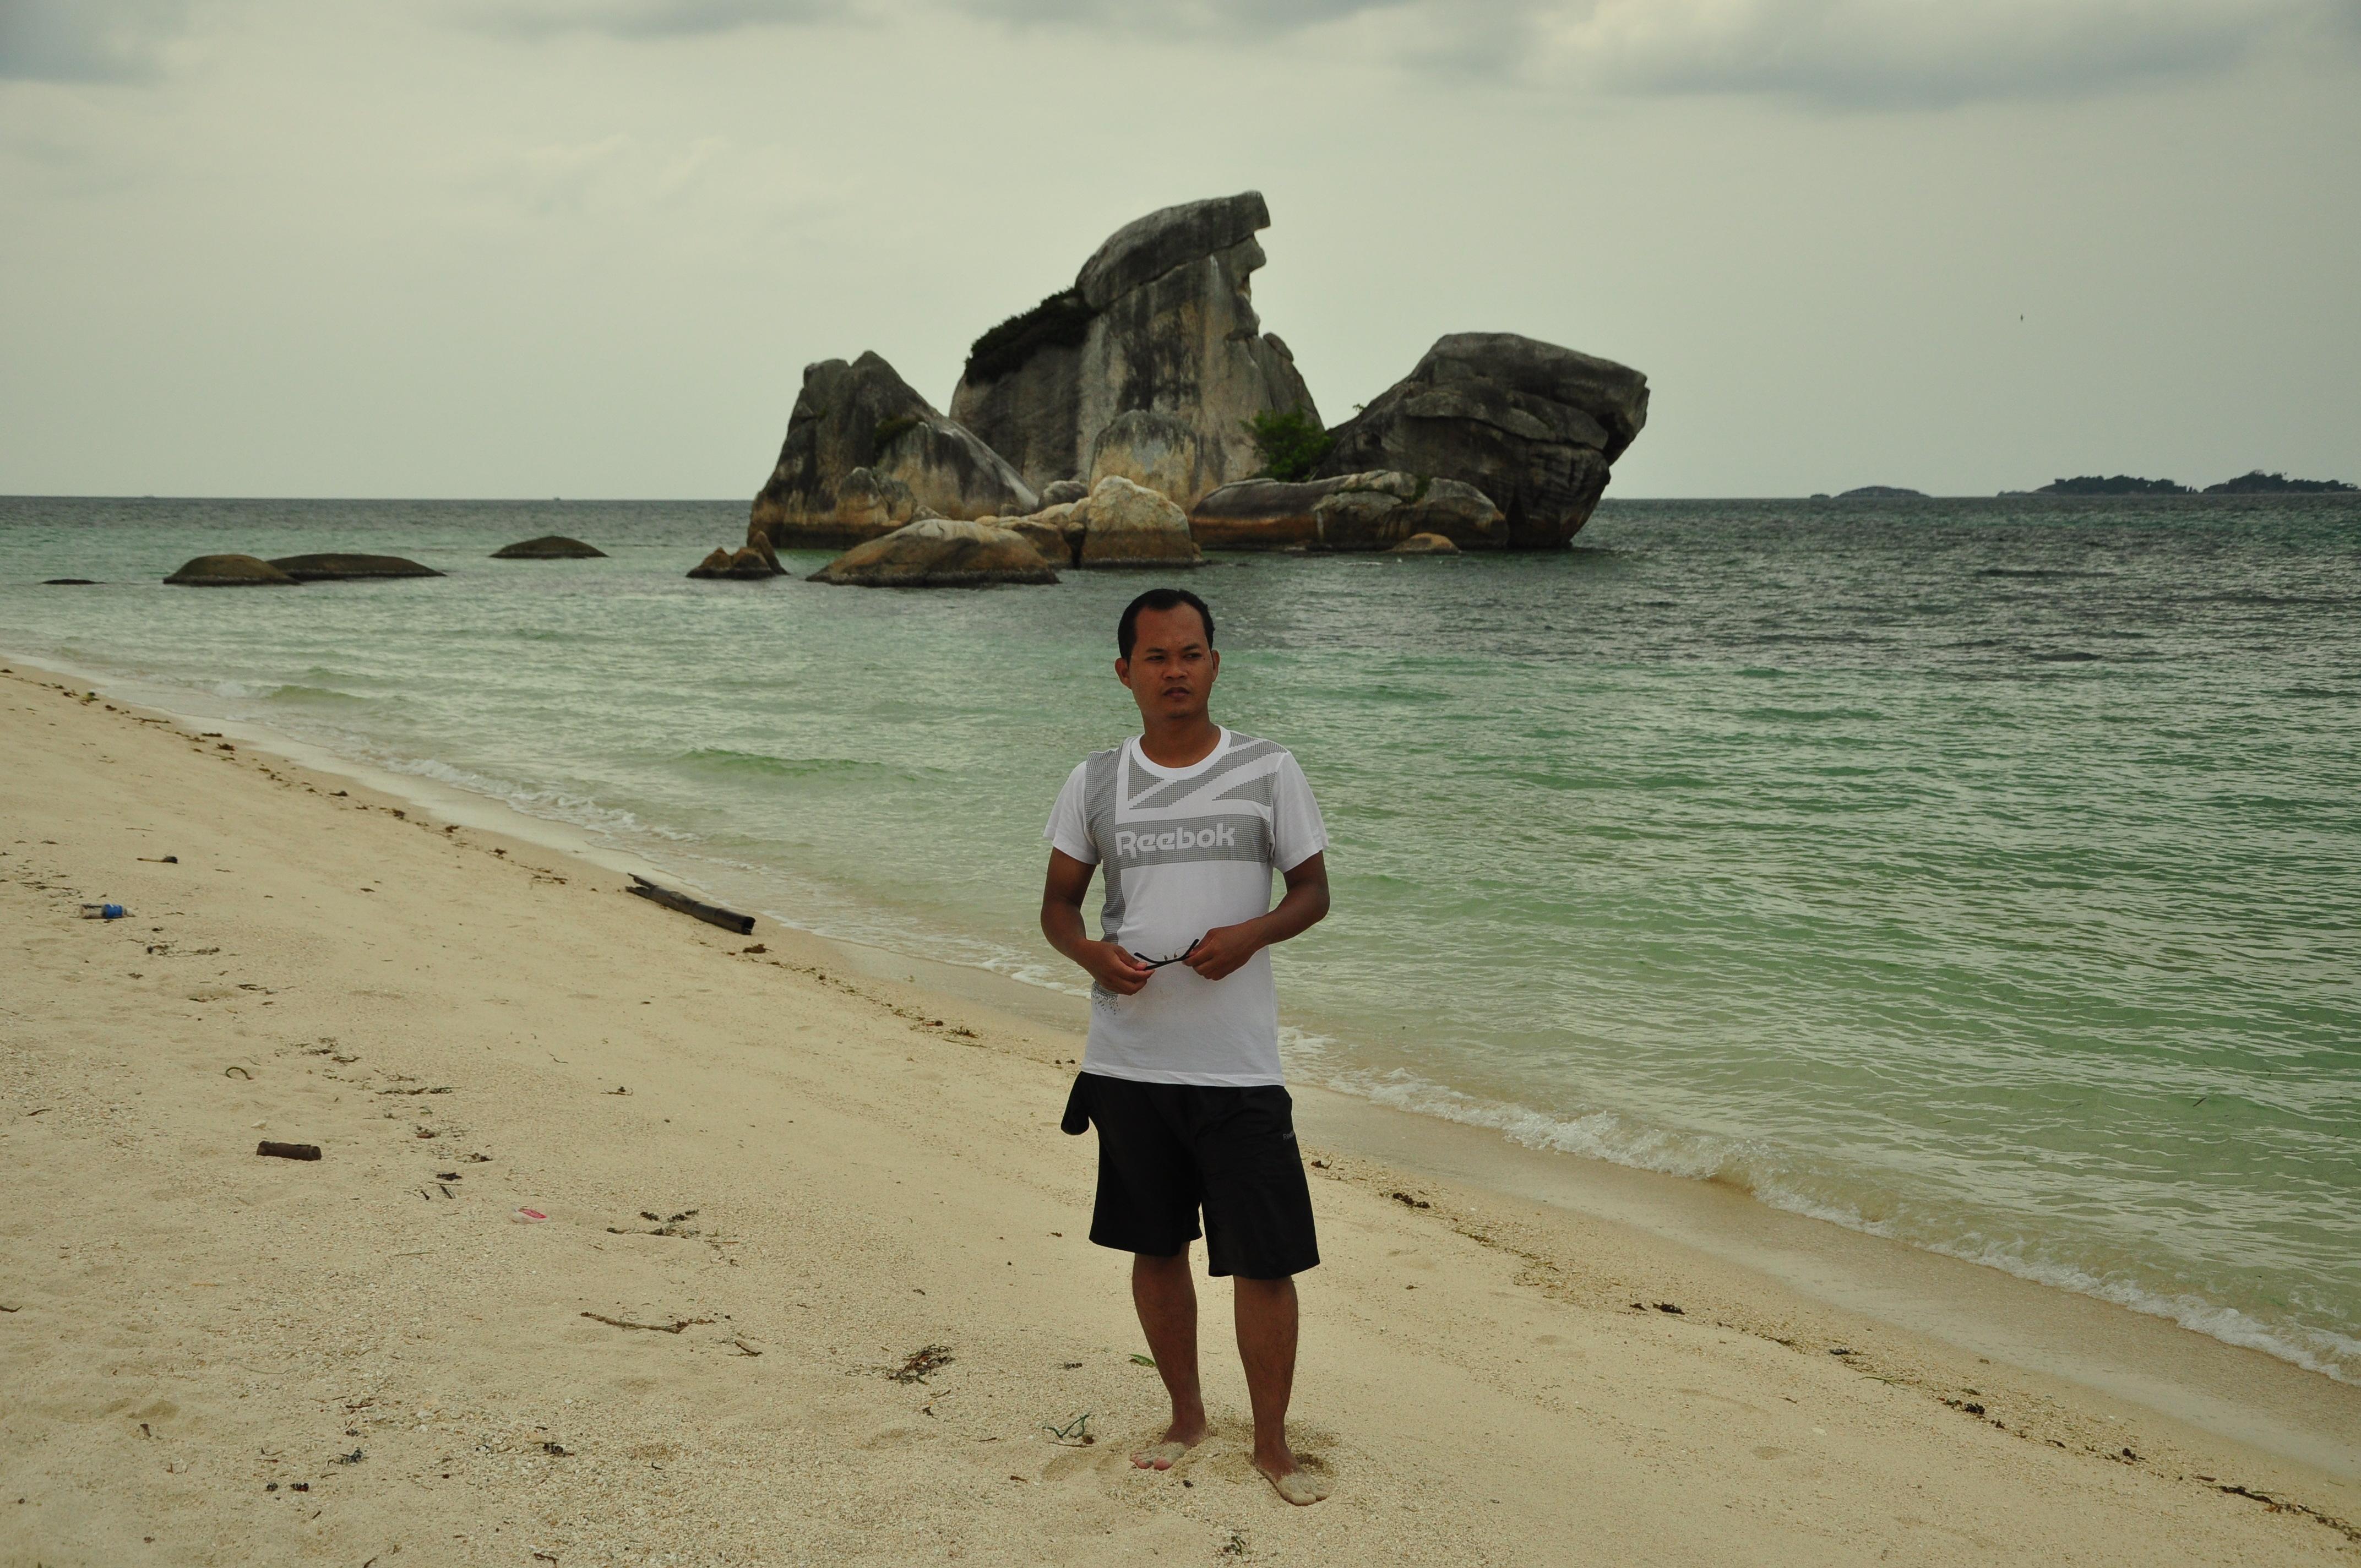 Pecintawisata Traveling Photography Page 21 Dinamakan Pulau Burung Tumpukan Batu